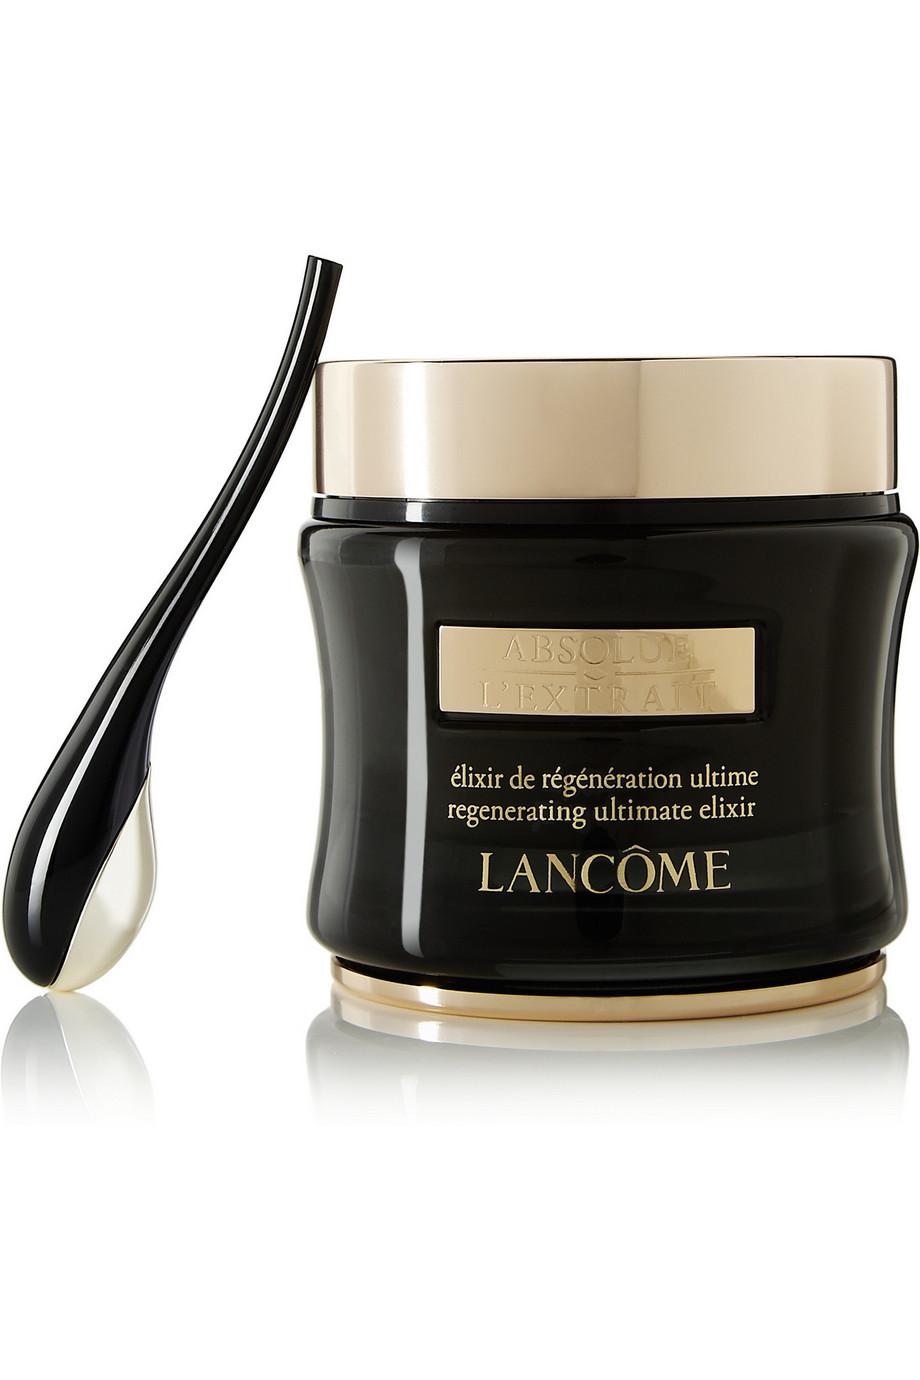 Absolue L'extrait Ultimate Rejuvenating Elixir, 50ml, by Lancôme